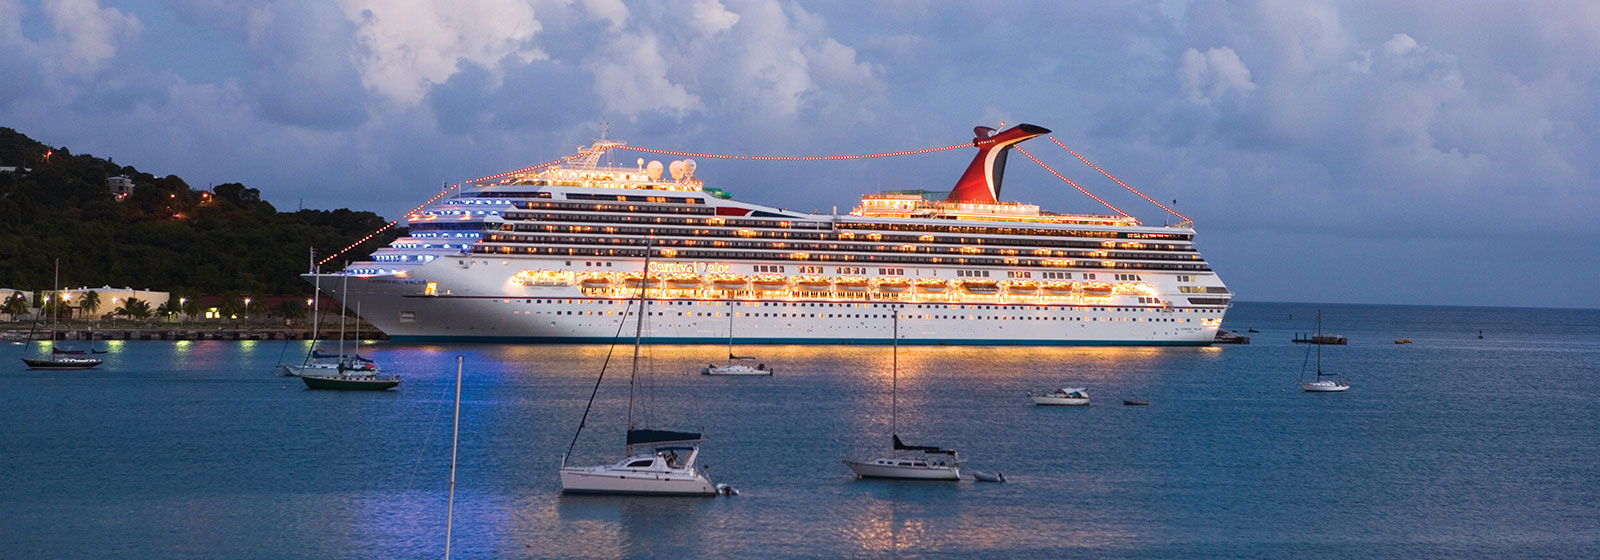 Valor - Carnival Cruises